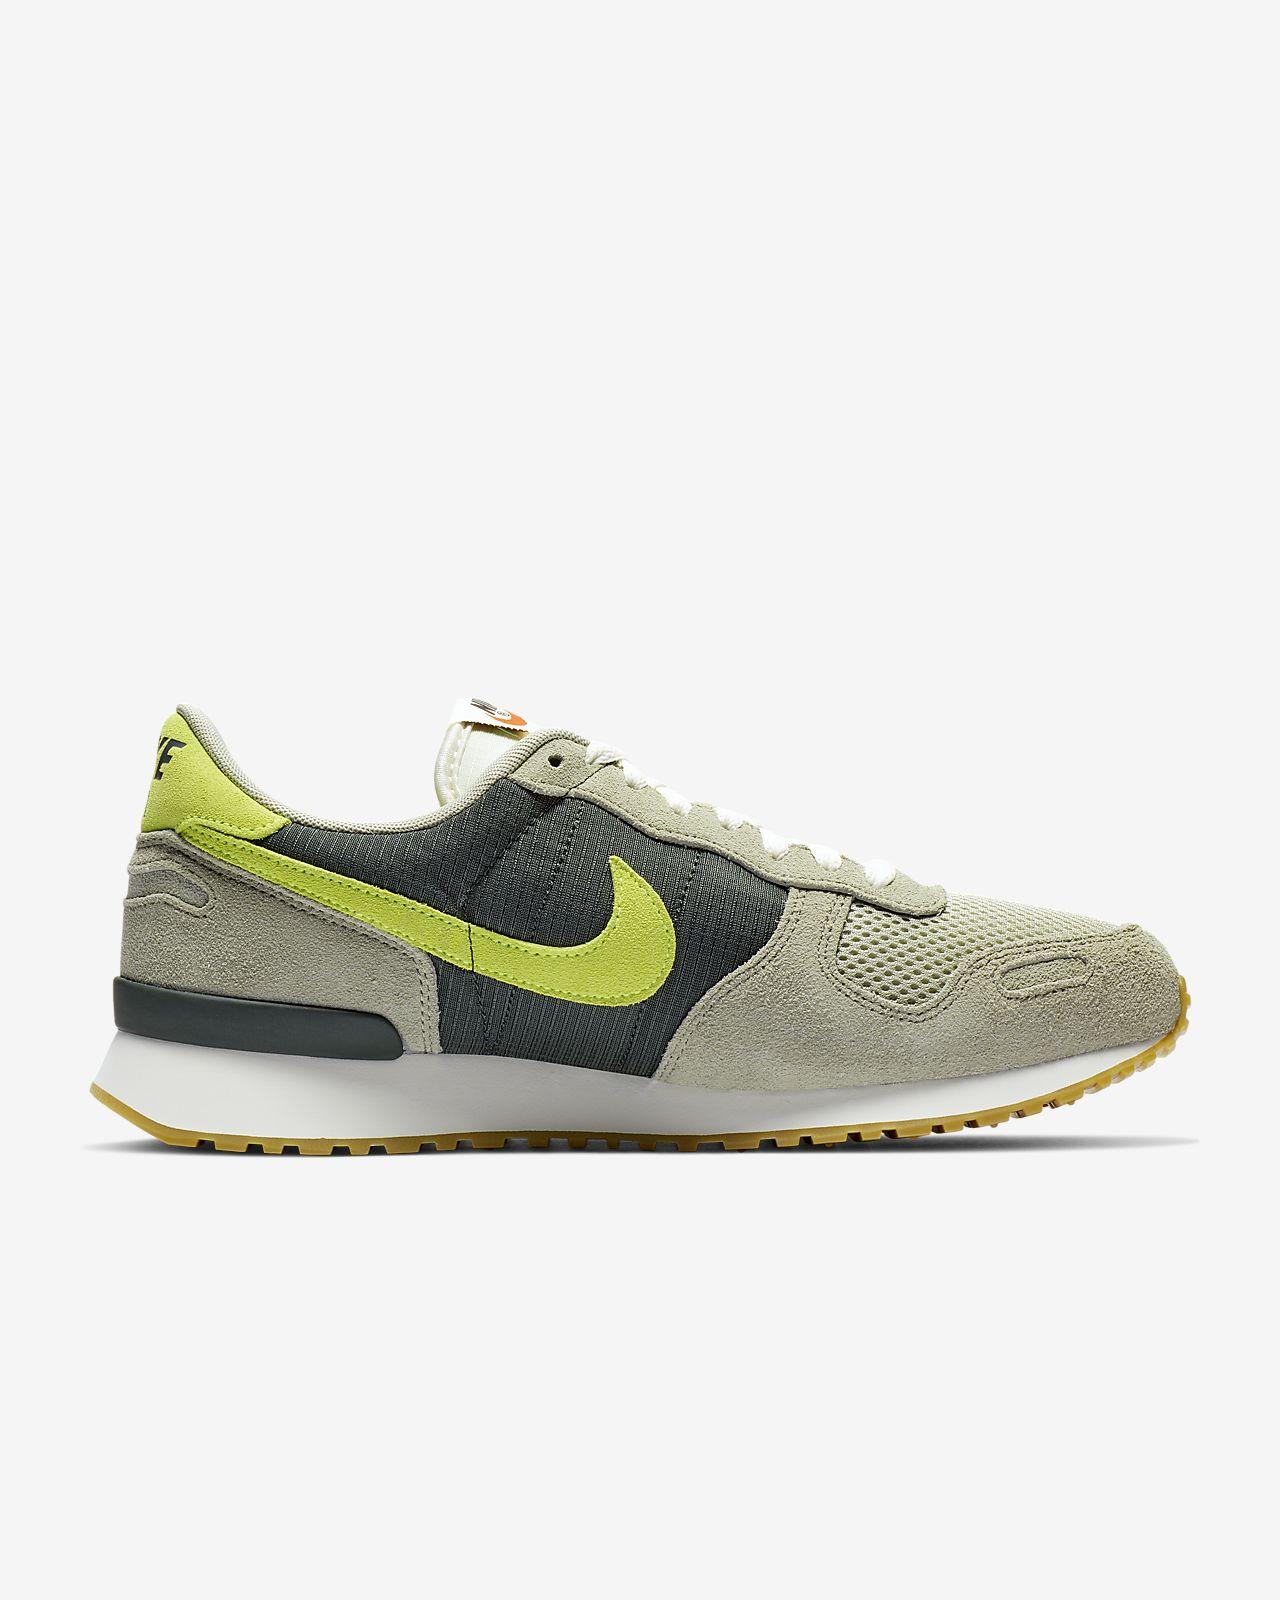 newest 08afc 81707 Nike Air Vortex Men s Shoe. Nike.com CH